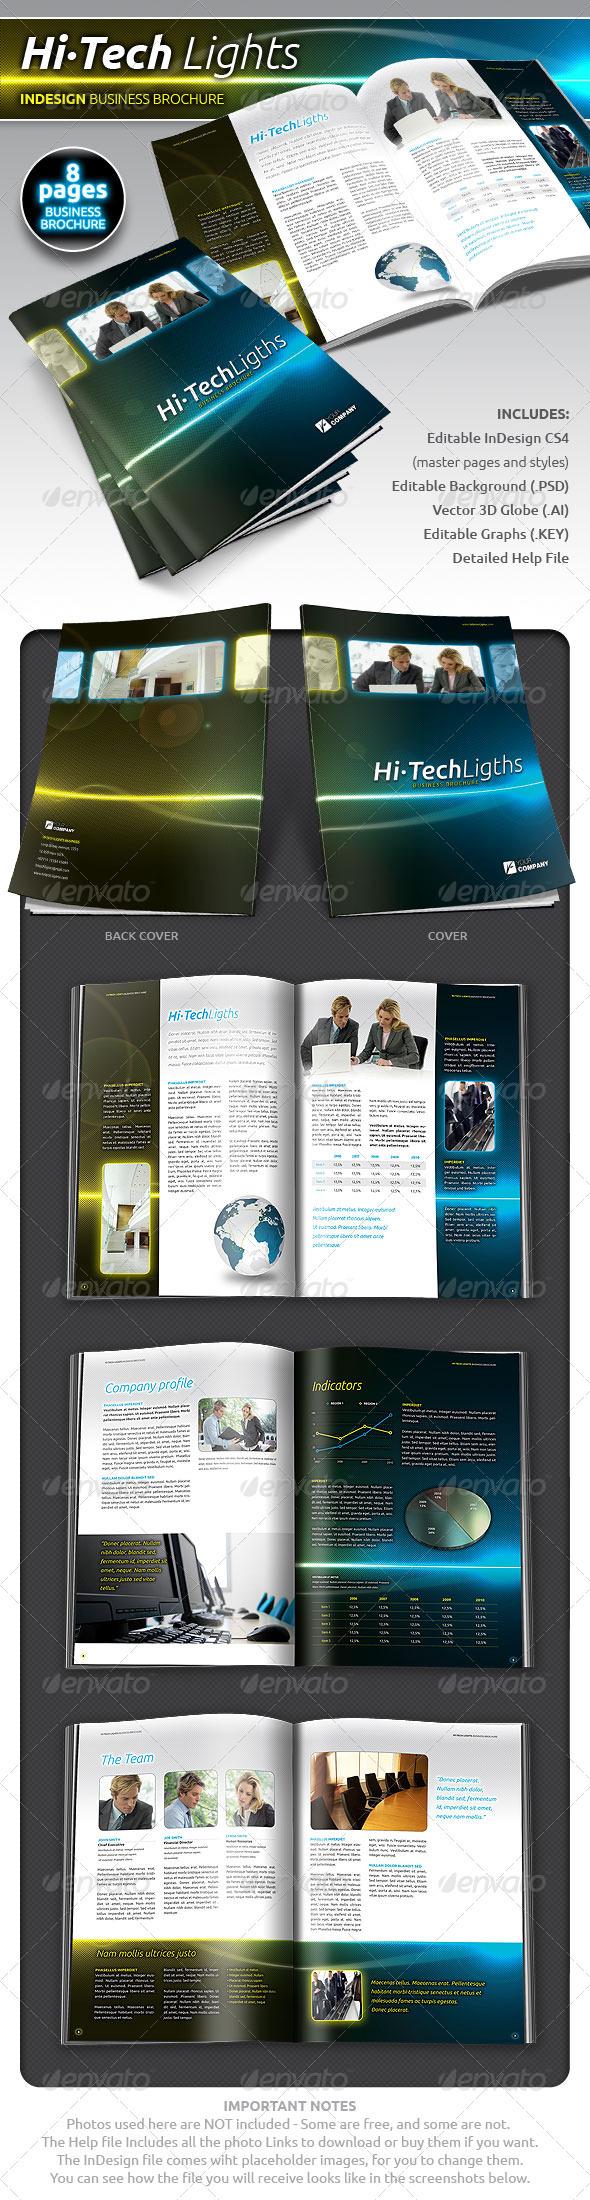 GraphicRiver Hi-Tech Lights Business Brochure 400644